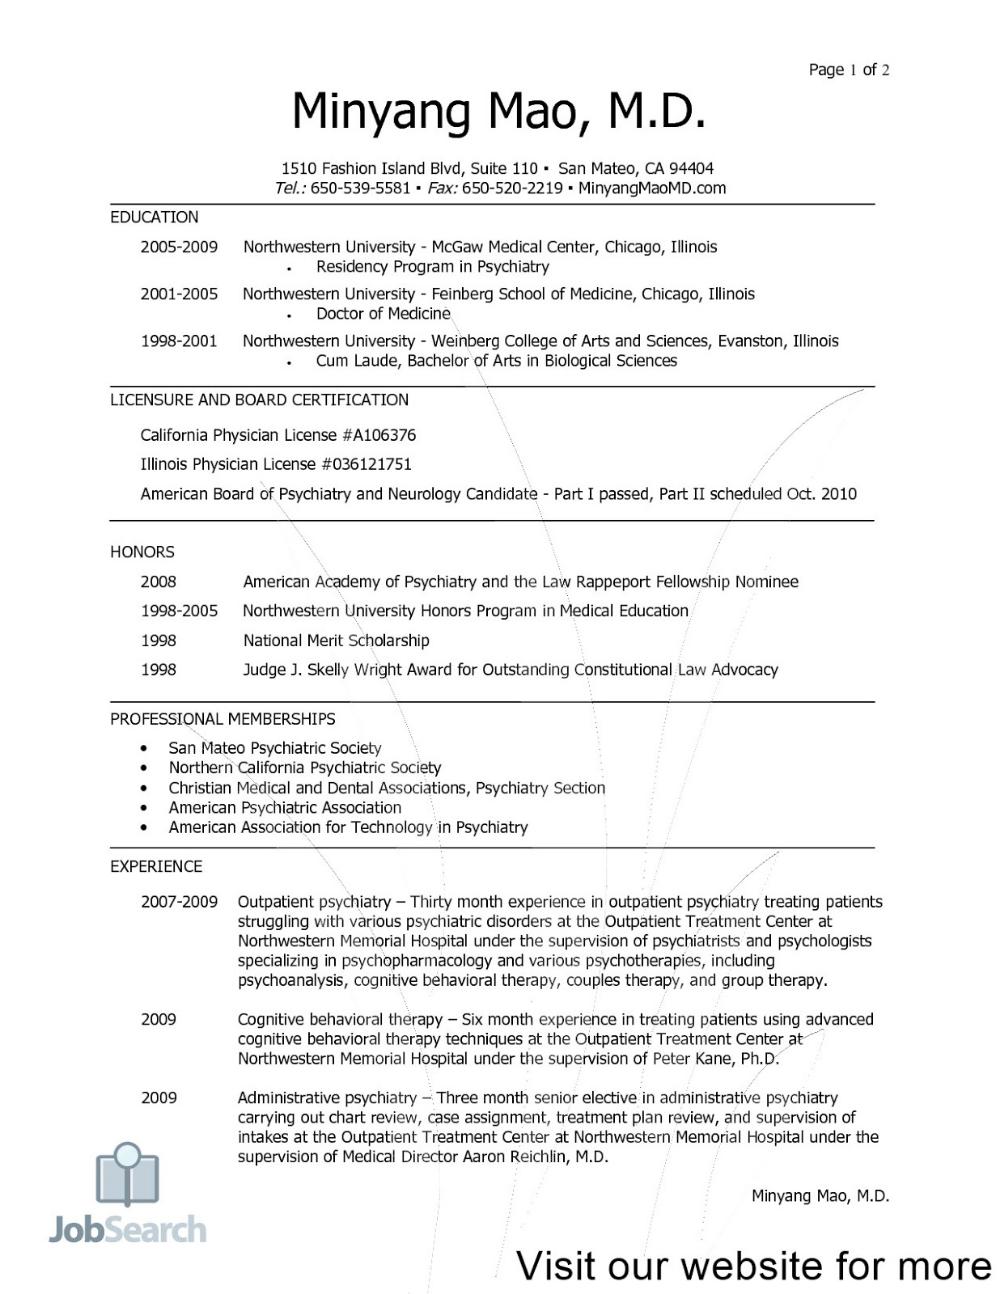 Healthcare Resume Templates 2020 Healthcare Resume Templates Healthcare Resume Templates Fre Resume Template Word Resume Template Downloadable Resume Template